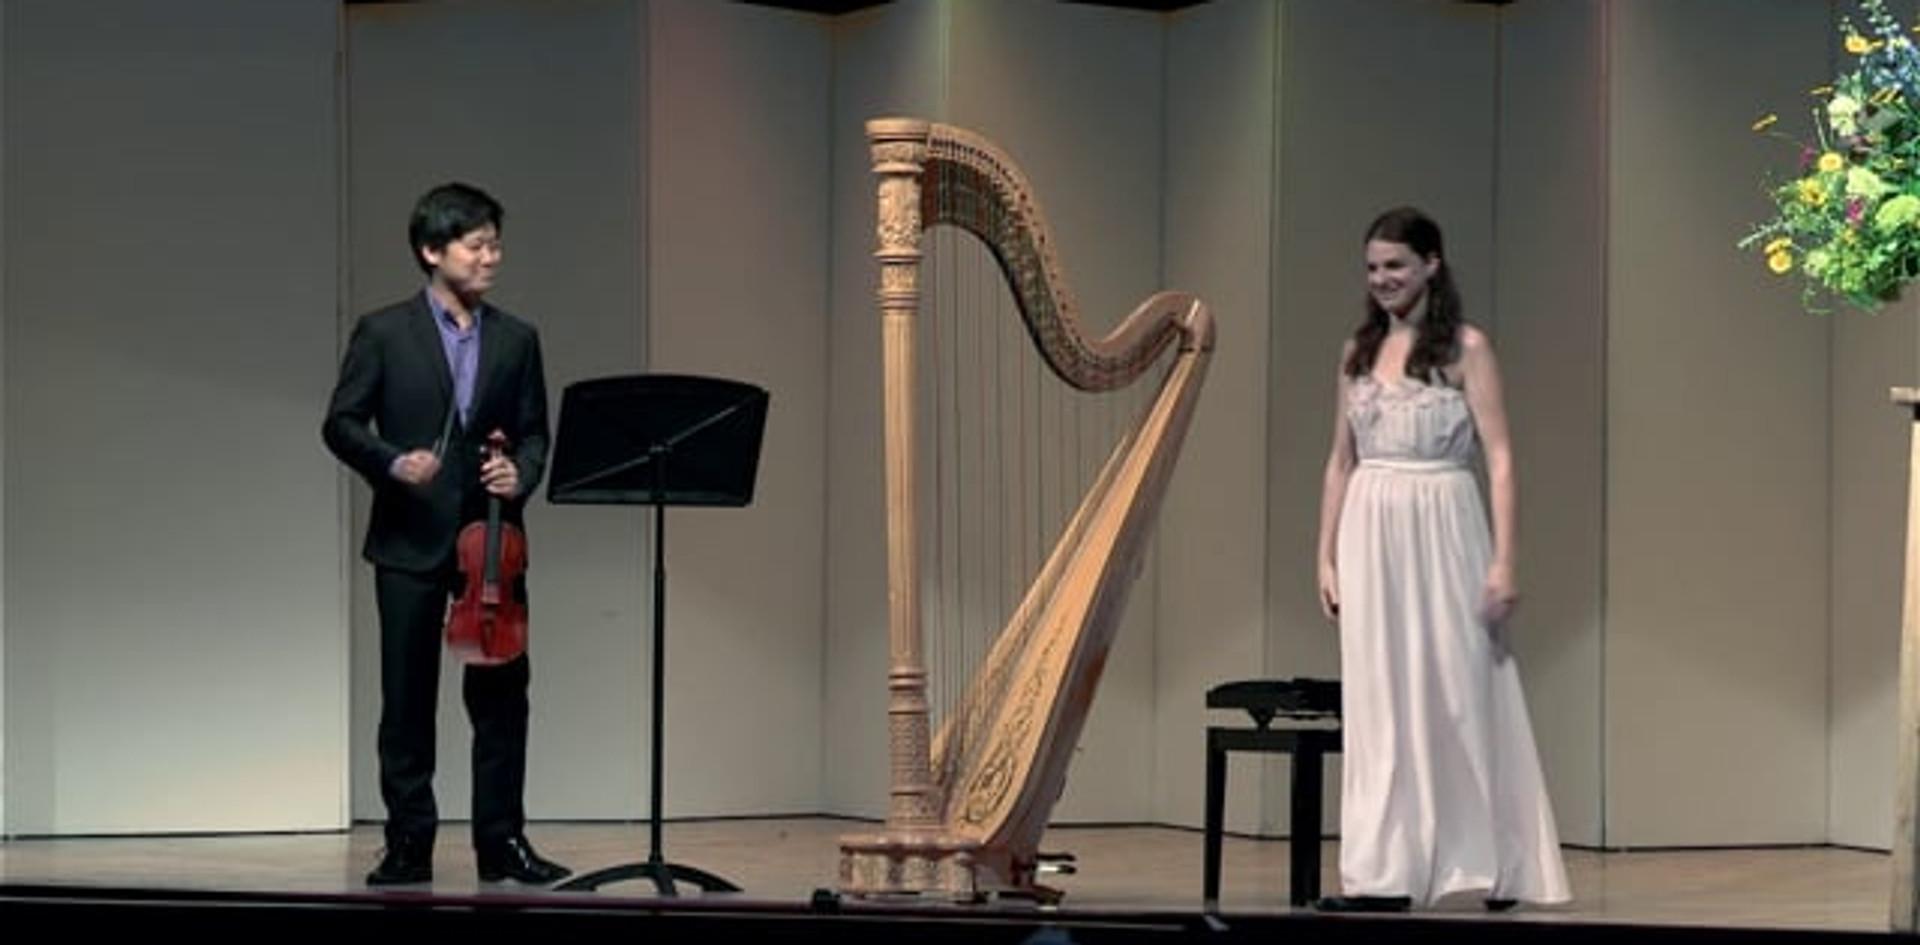 Bridget Kibbey and Siwoo Kim play J.S. Bach: BWV 1020 I. Allegro